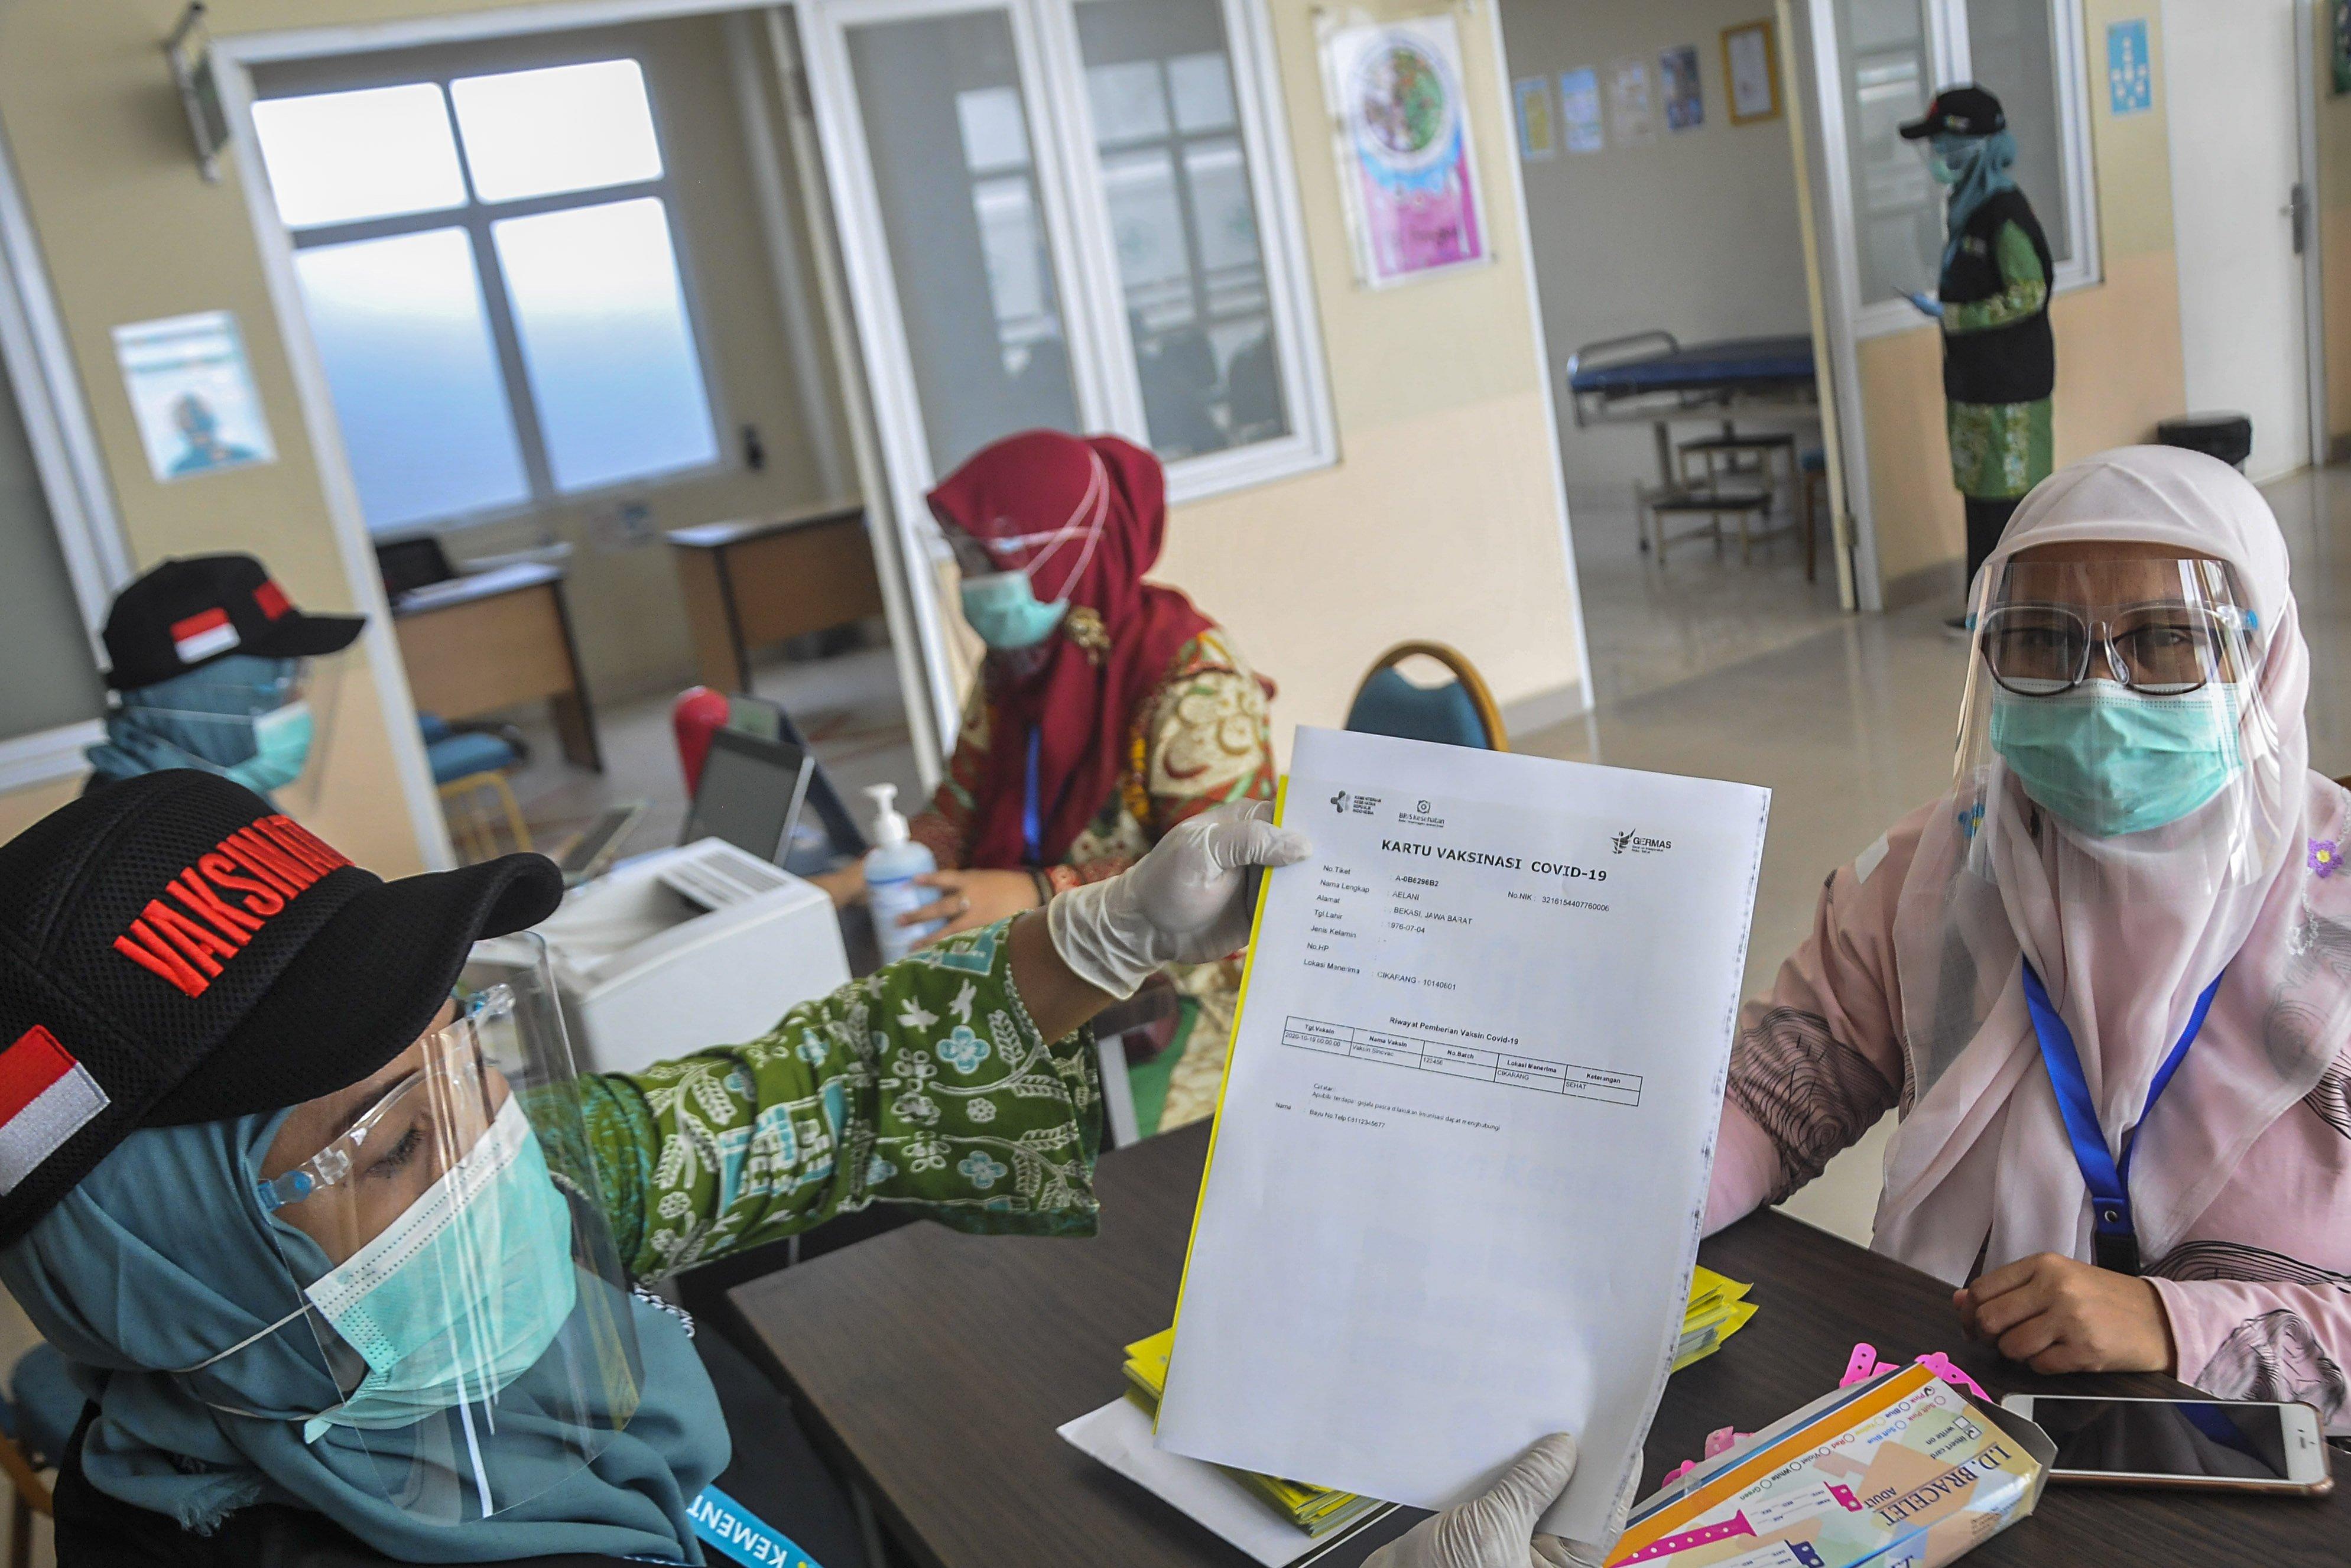 Petugas medis memberikan surat vaksinasi COVID-19 kepada warga saat simulasi di Puskesmas Cikarang, Kabupaten Bekasi, Jawa Barat, Kamis (19/11/2020). Simulasi vaksinasi COVID-19 tersebut merupakan bagian dari upaya pemerintah menyampaikan sosialisasi tentang vaksin COVID-19 yang saat ini masih dalam tahap uji klinis.